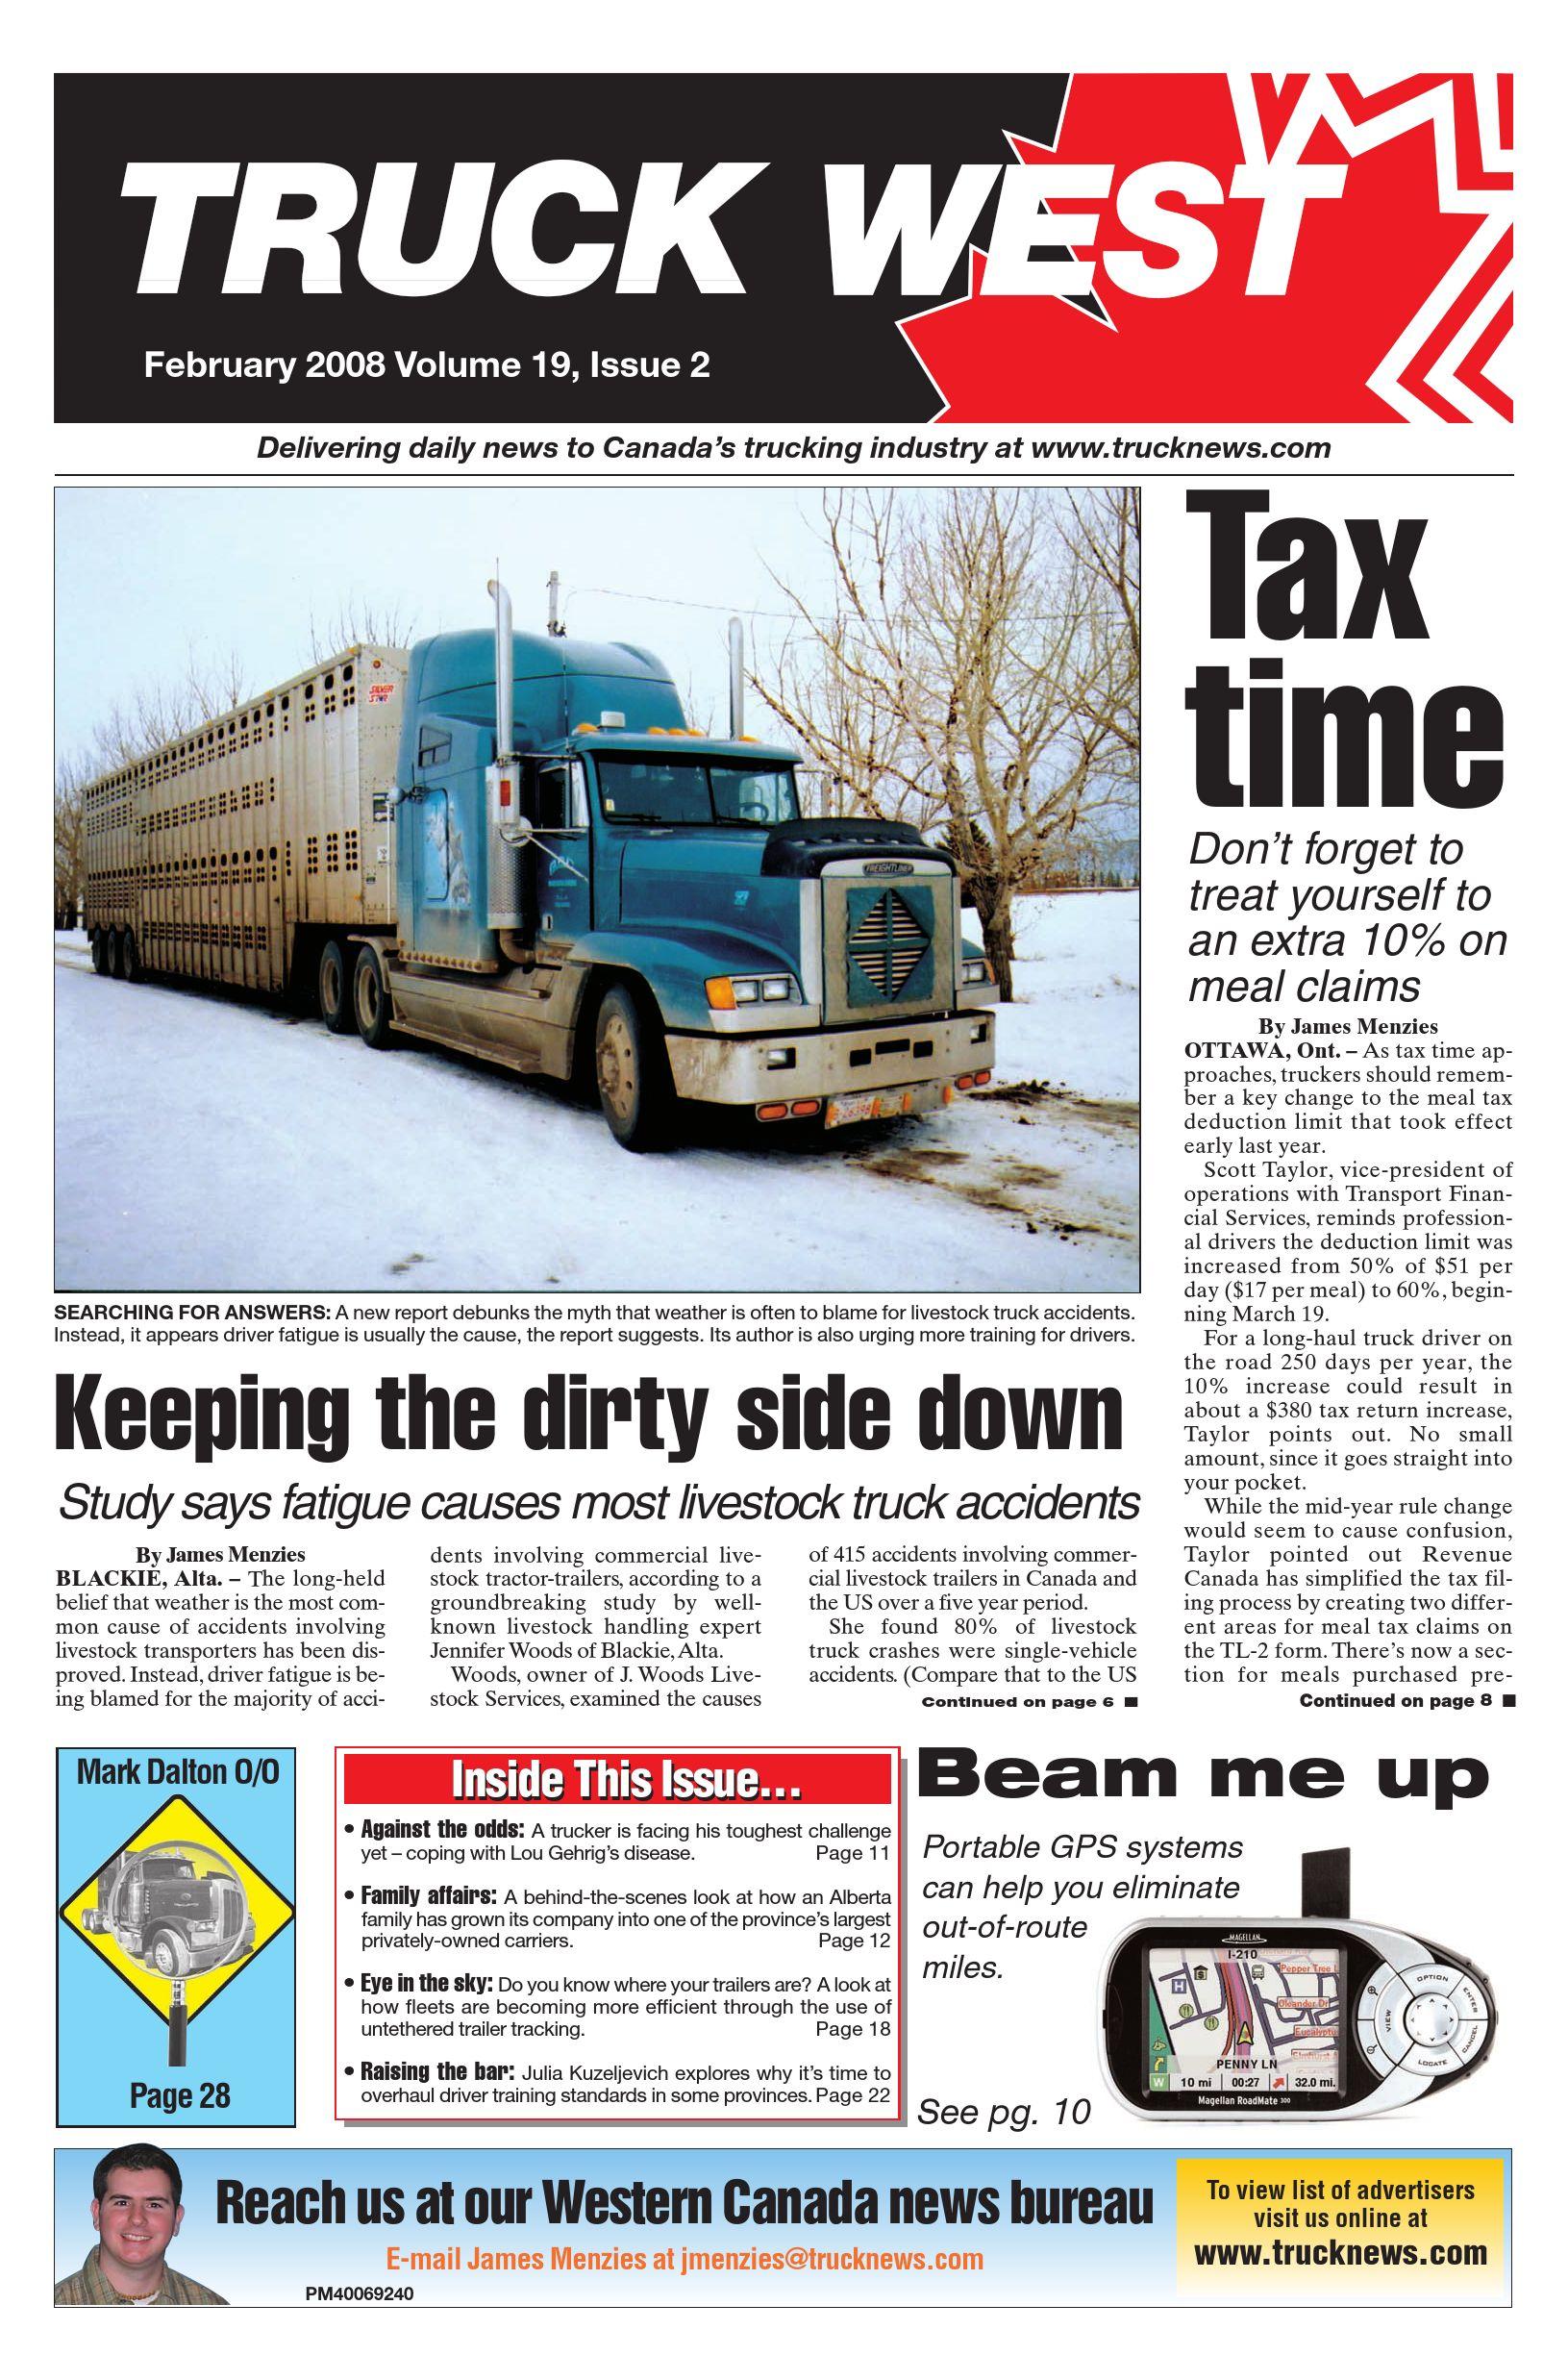 Truck News West – February 2008